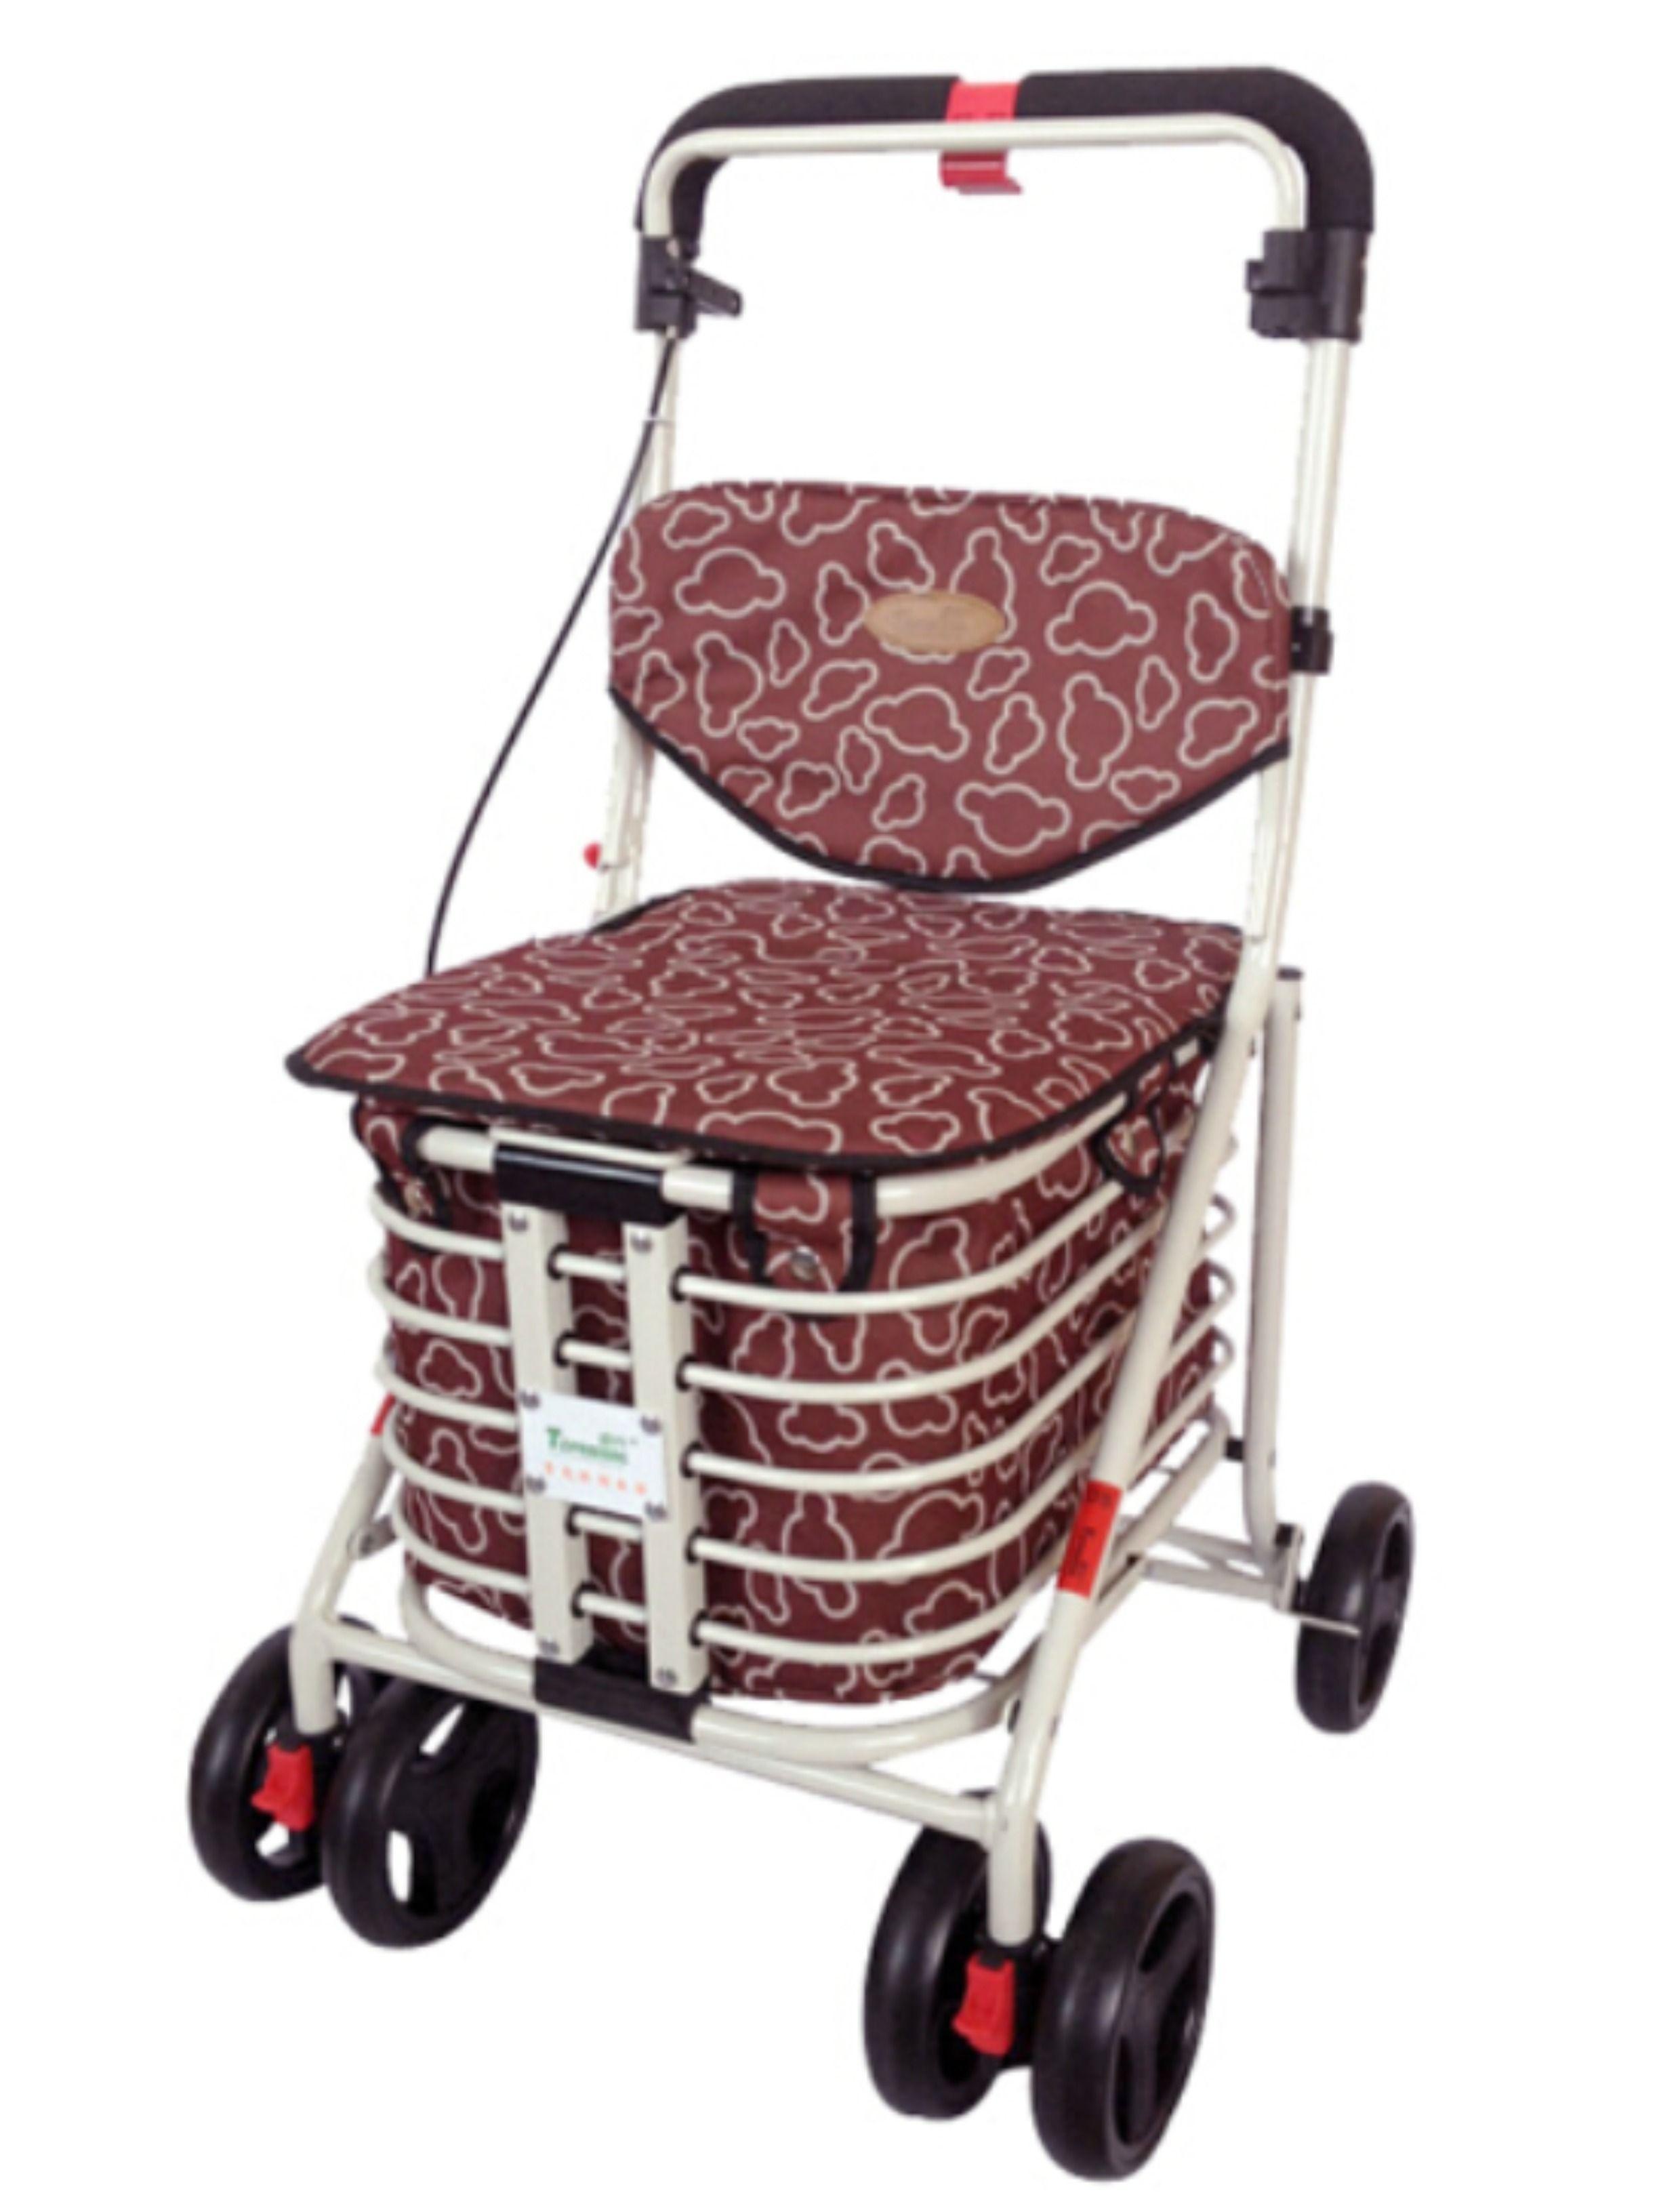 Elderly lady pushing a wheeled shopping trolley at shops